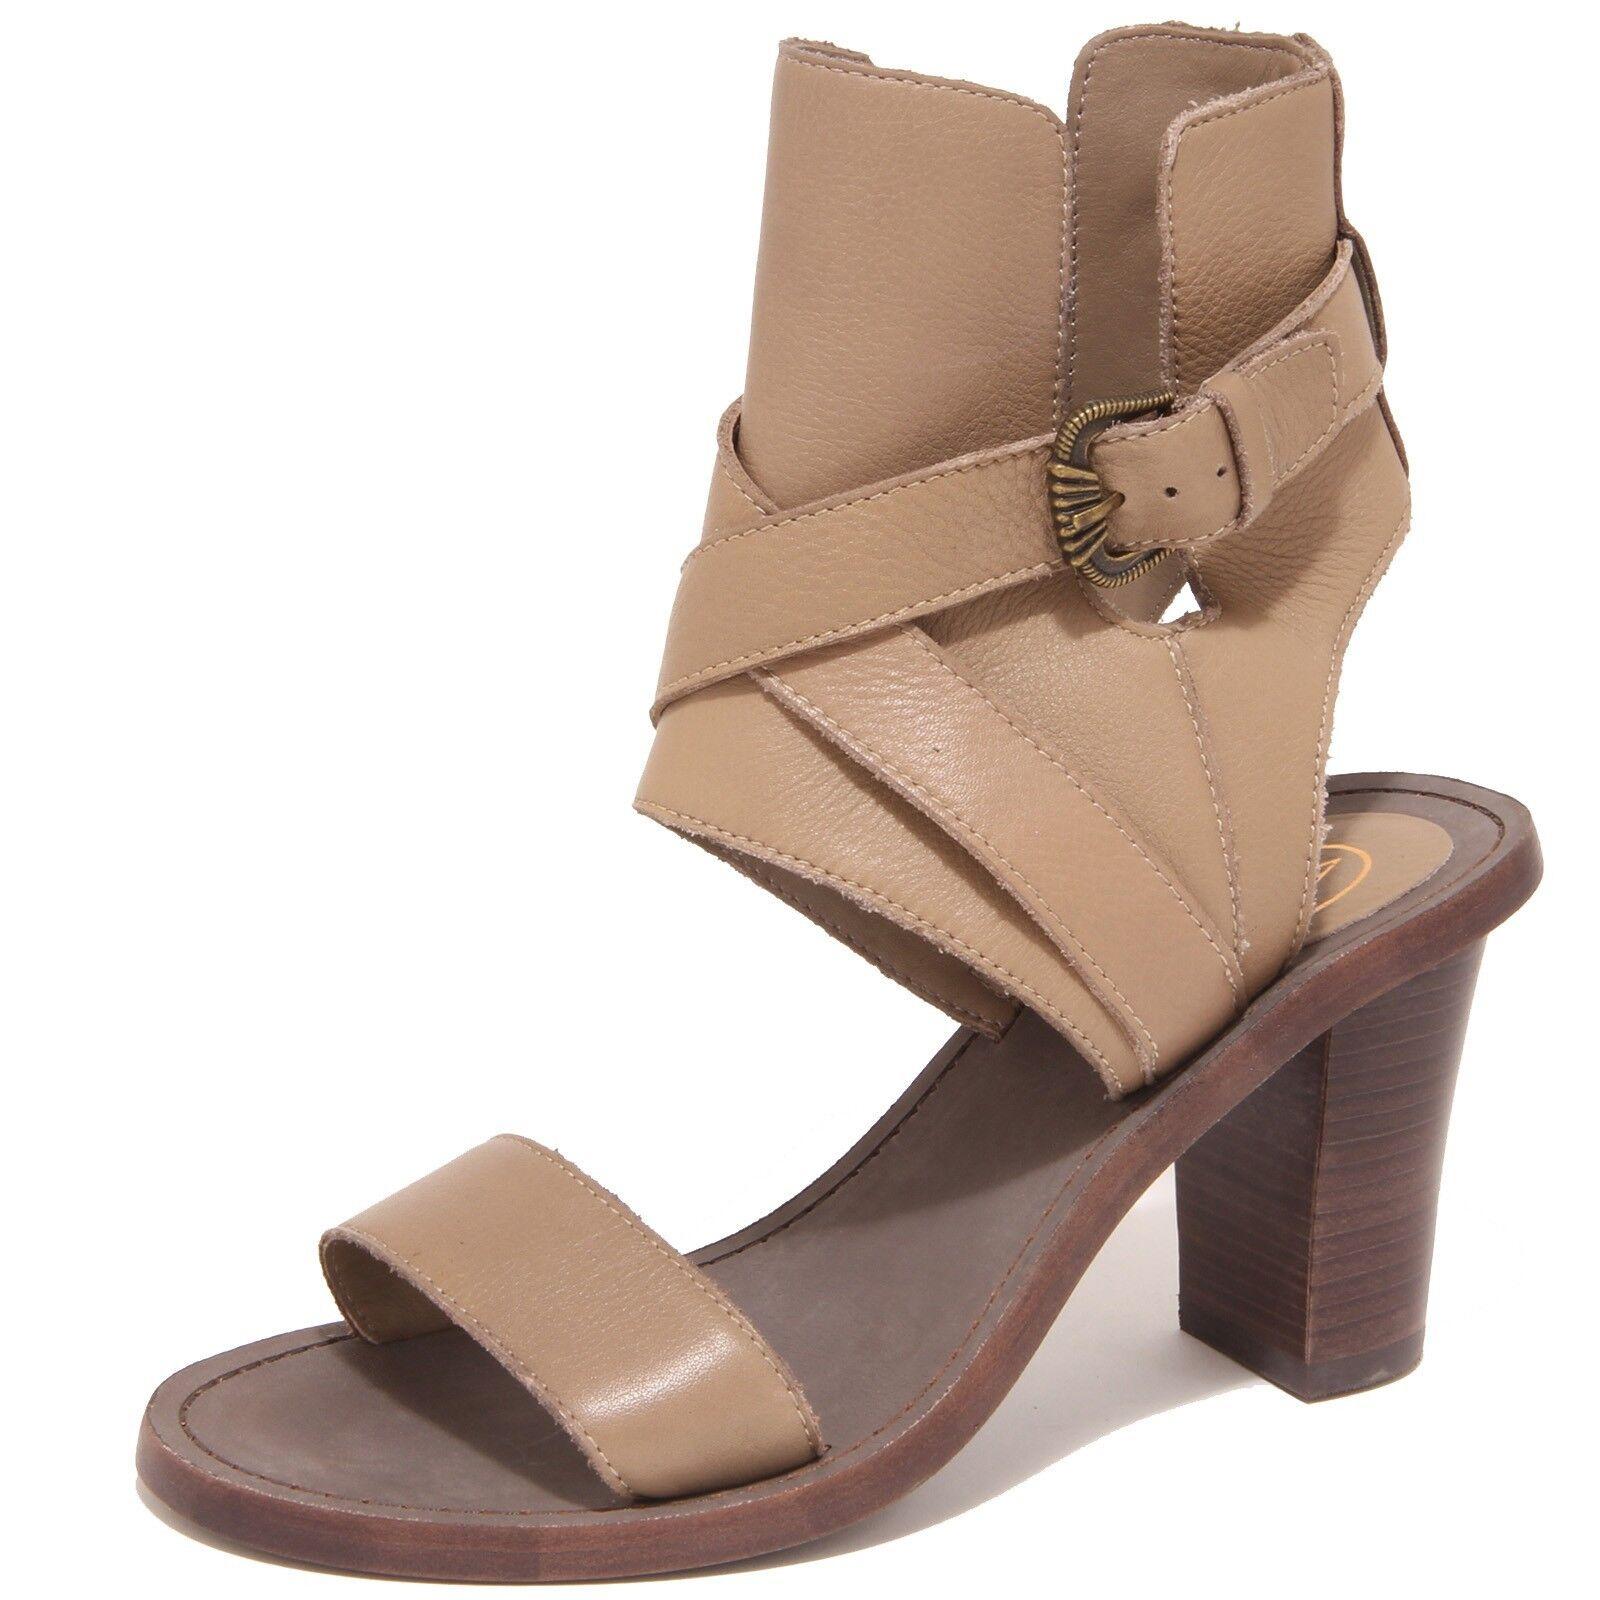 5695o Sandal Sandal Sandal kvinnor Ash Queenie Dove Sandal kvinna  Beställ nu lägsta priser